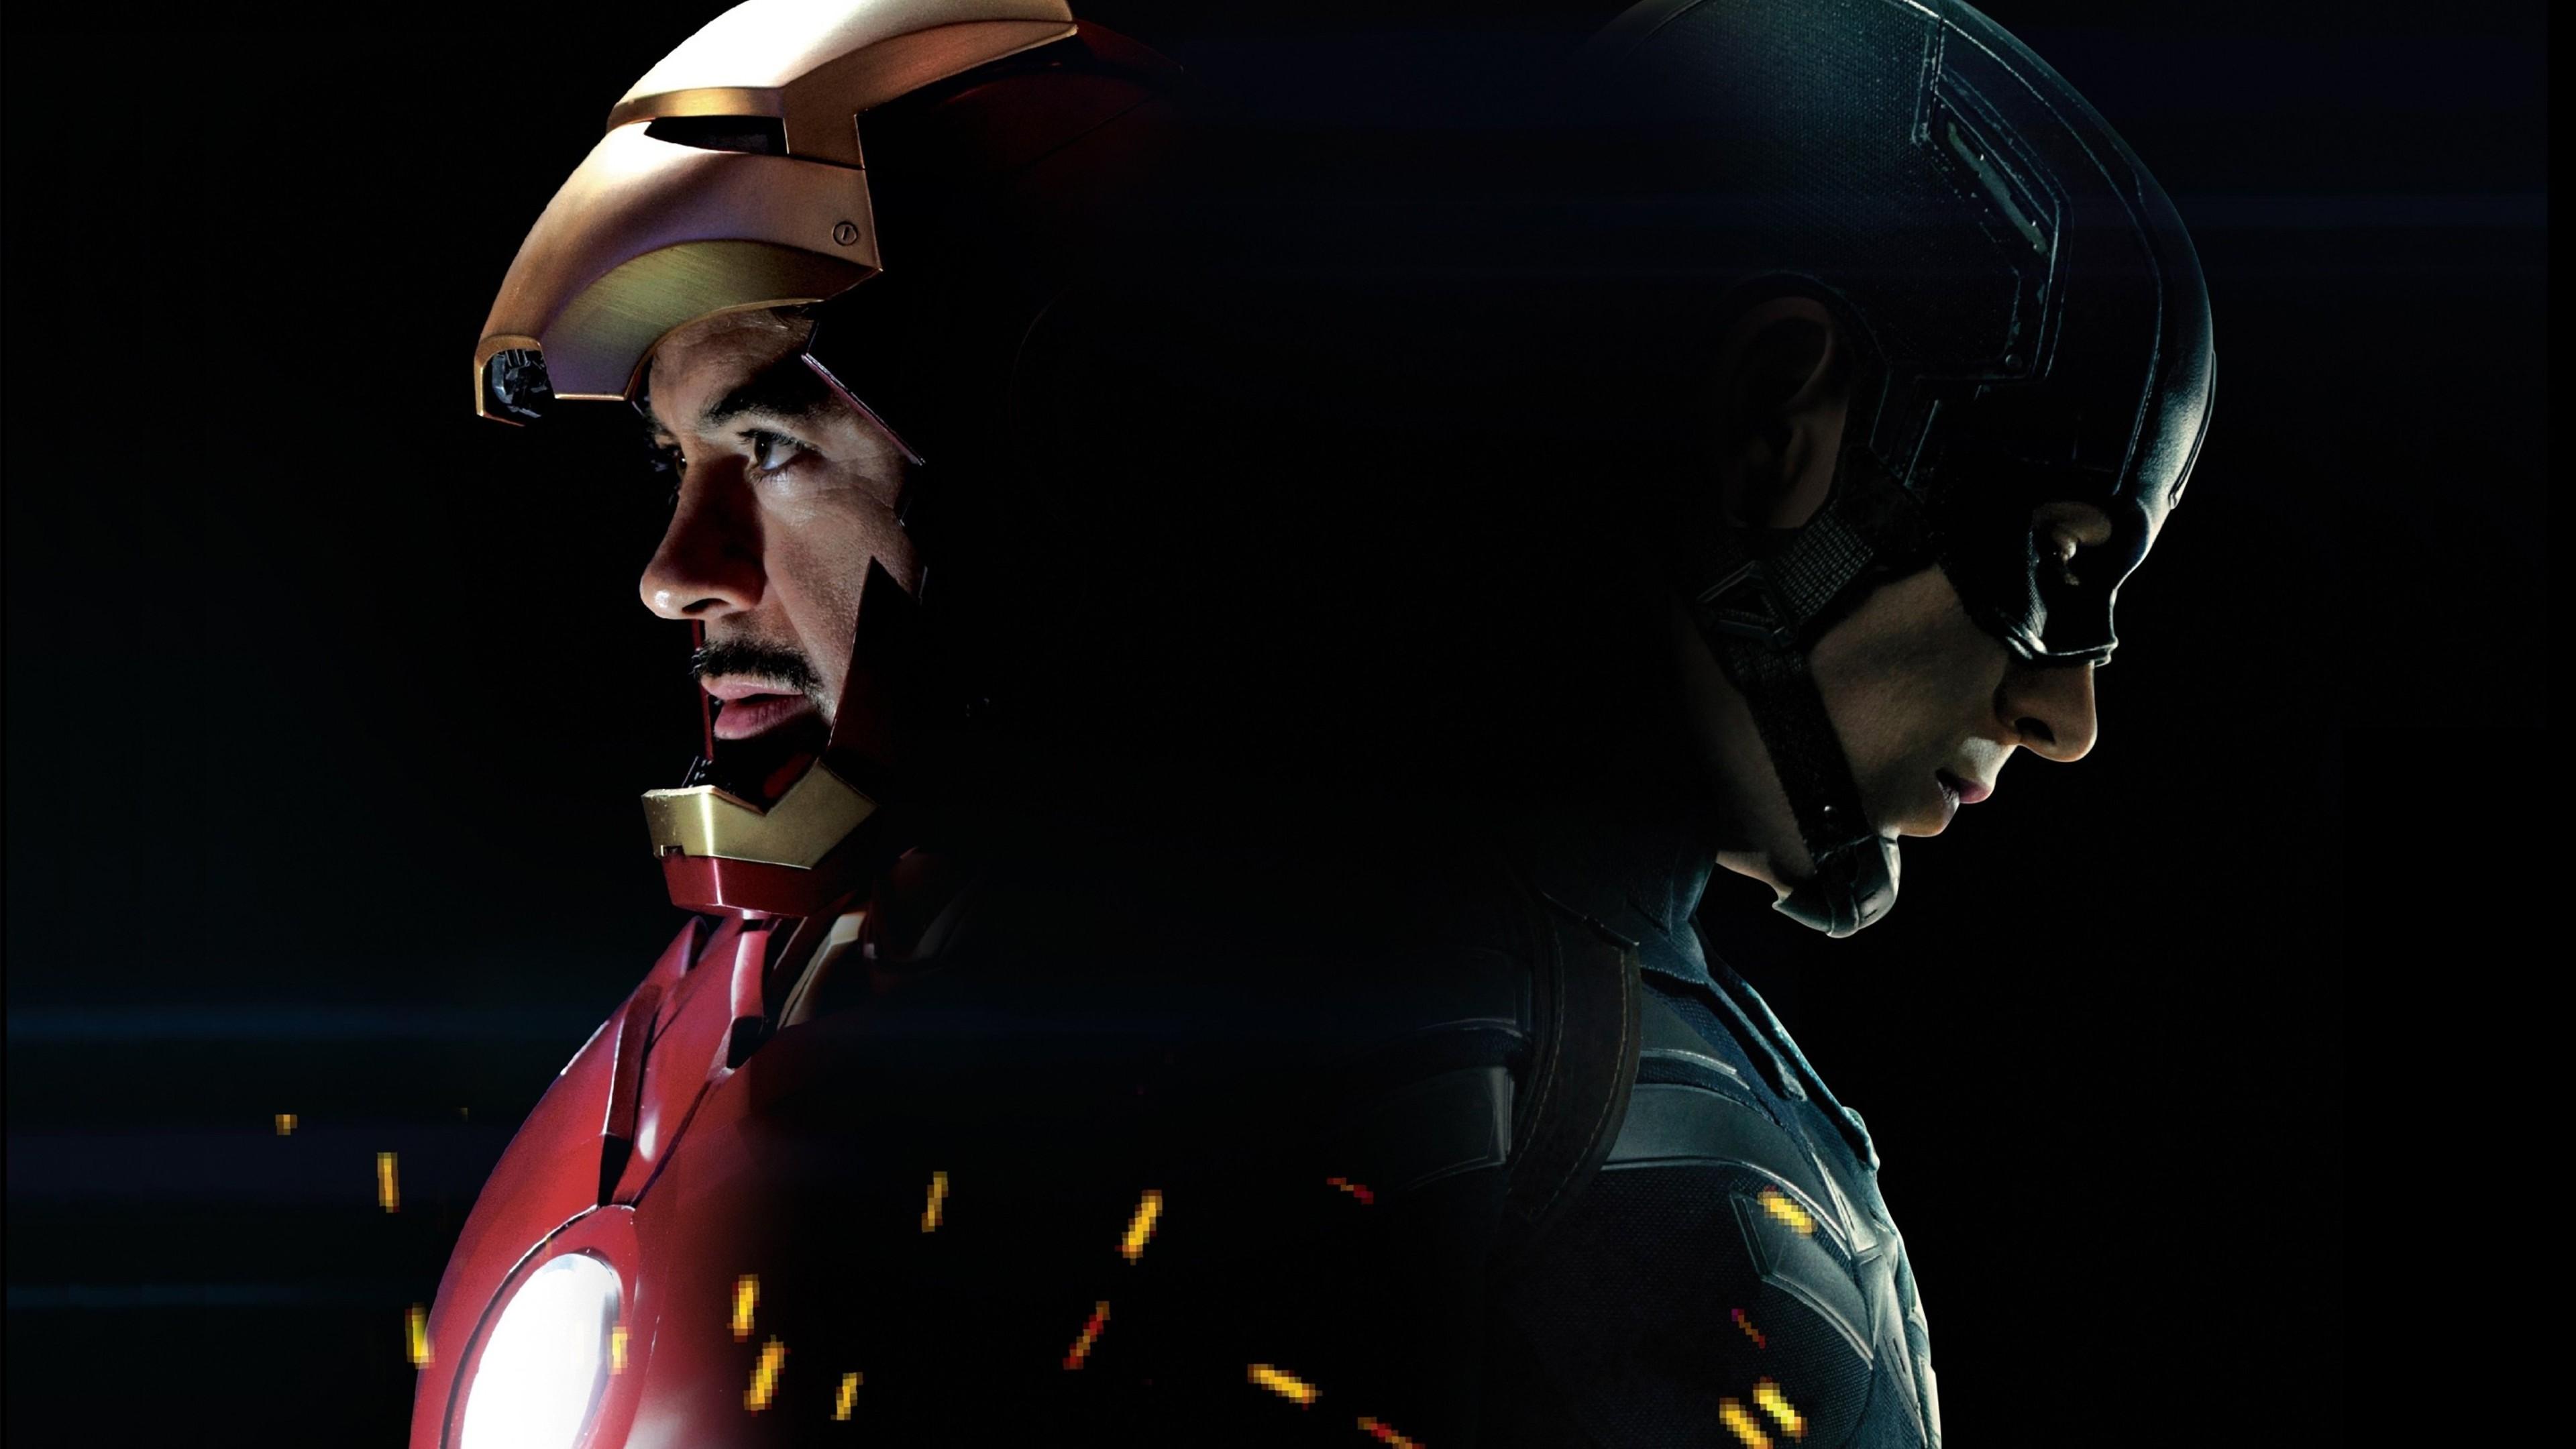 Captain america 3 civil war iron man hd movies 4k for Sfondi iron man